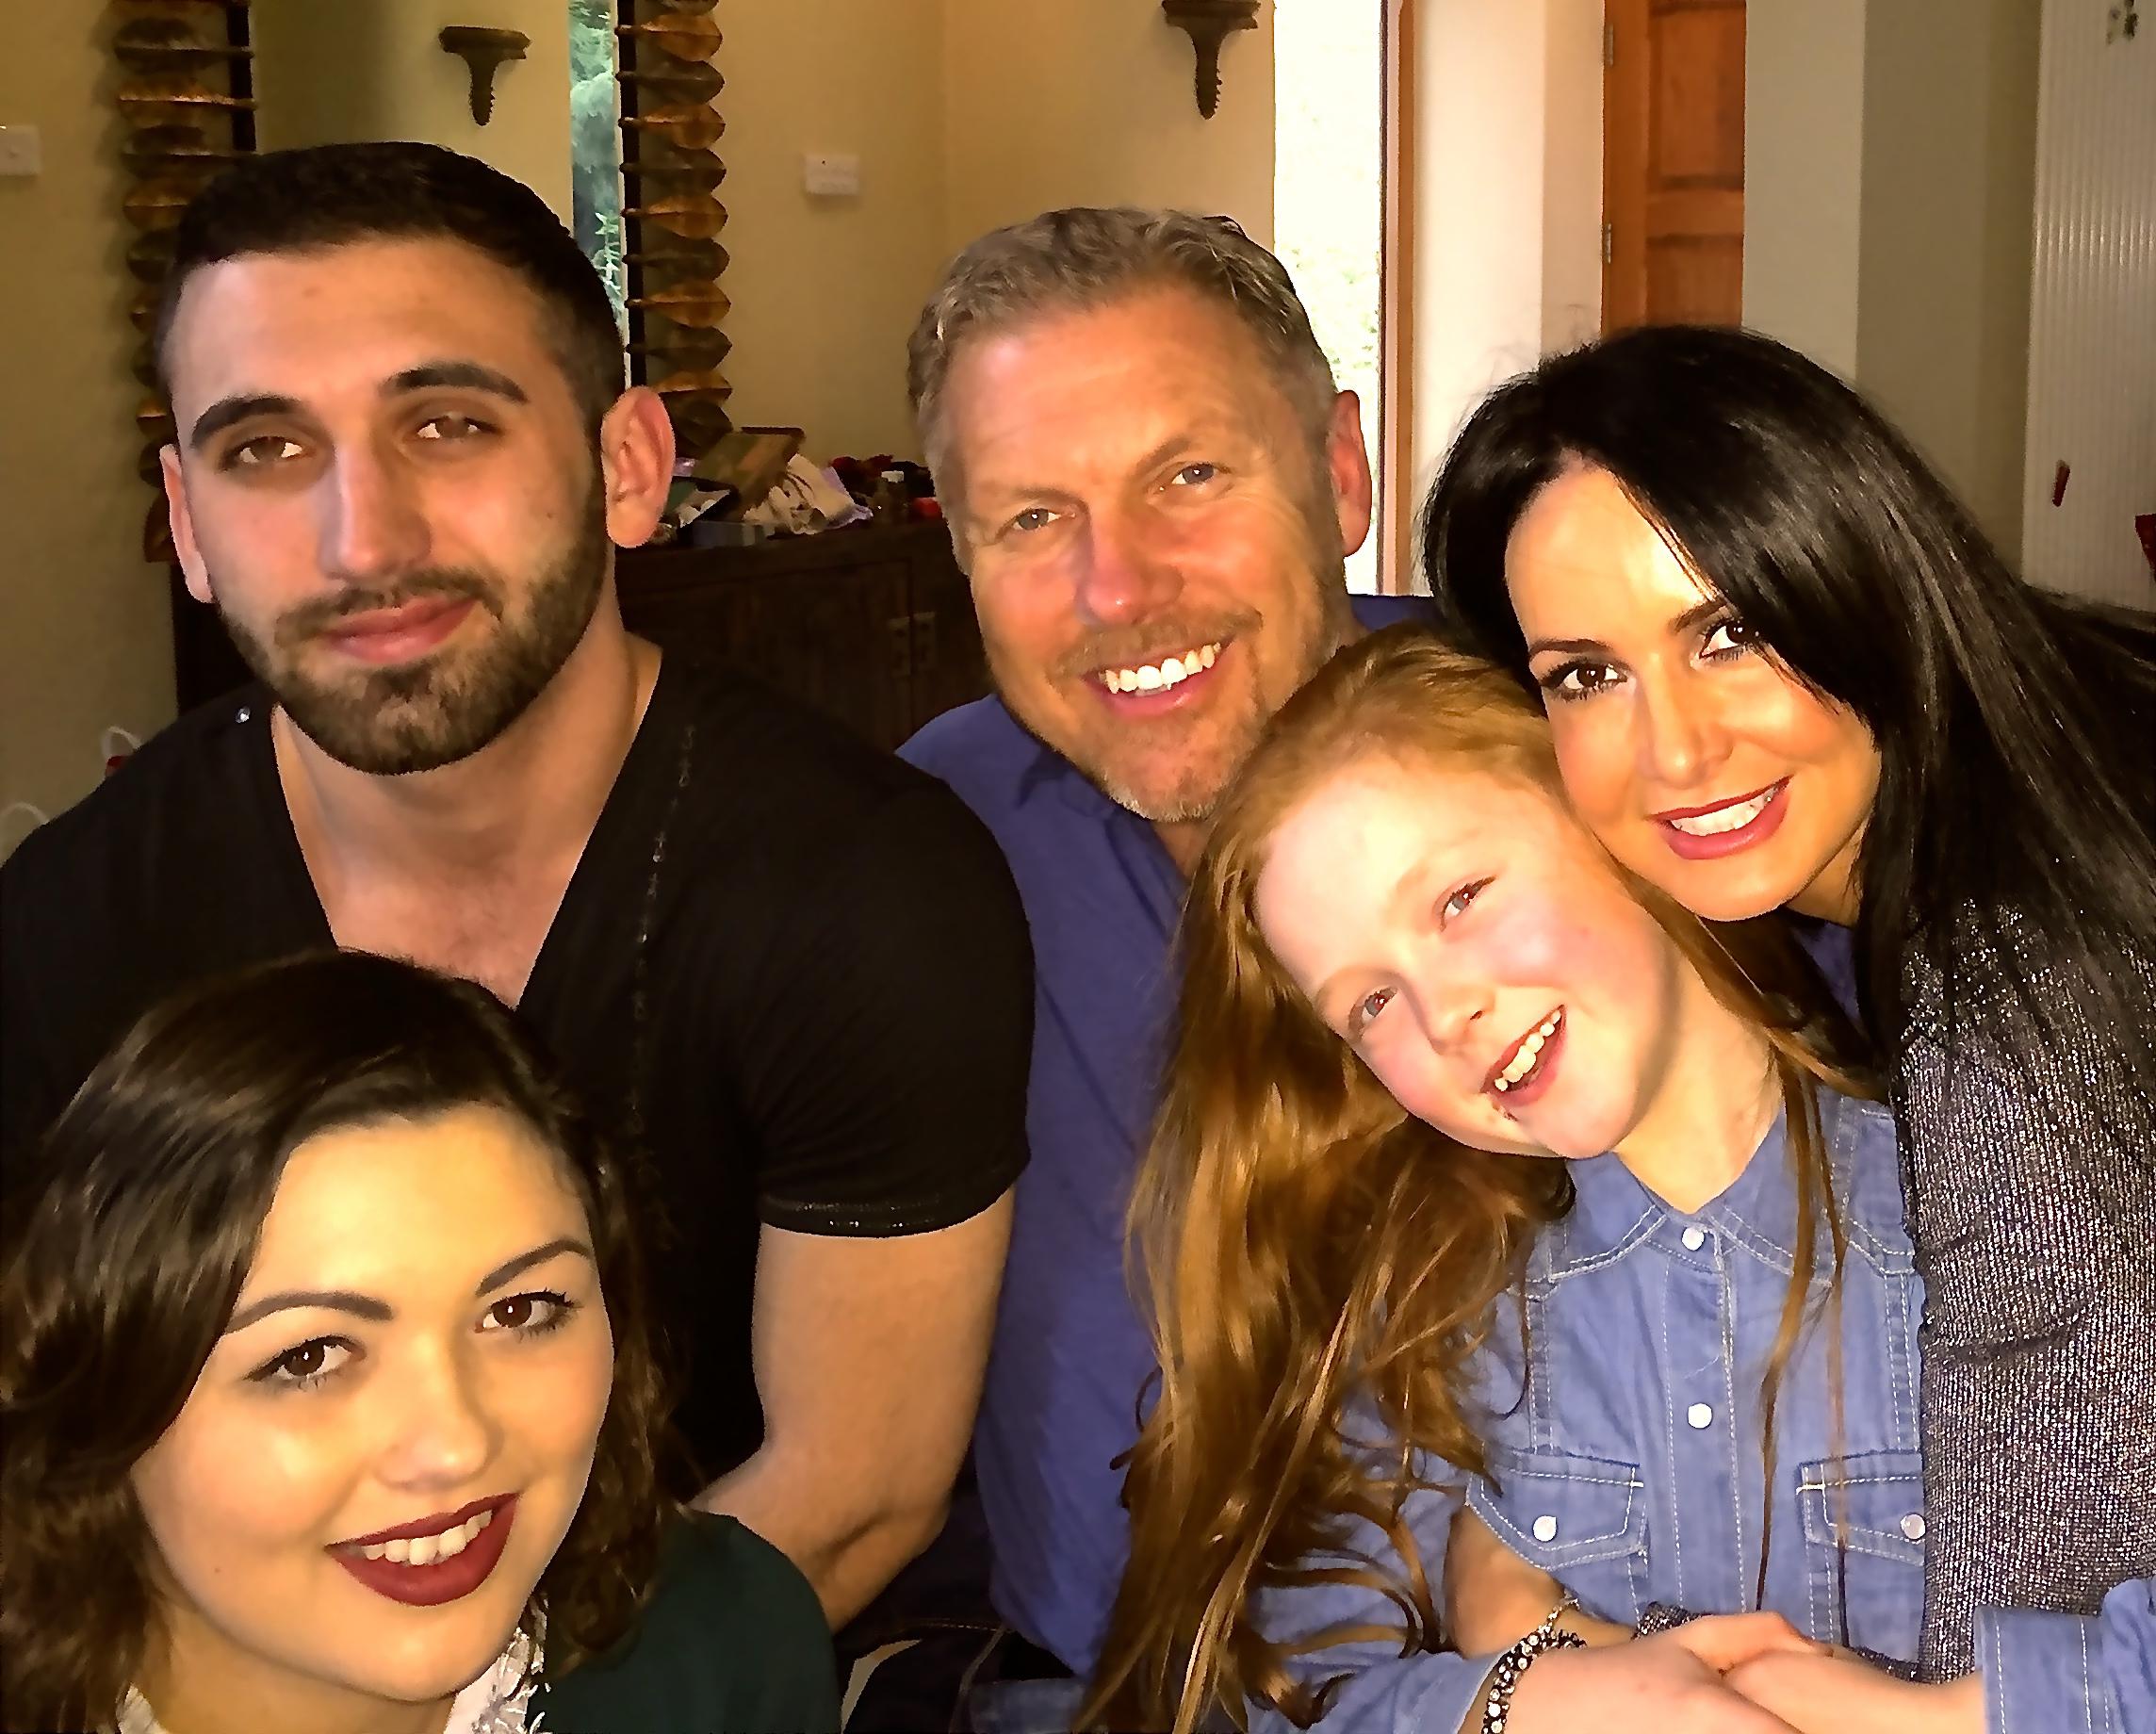 The Kenwright family